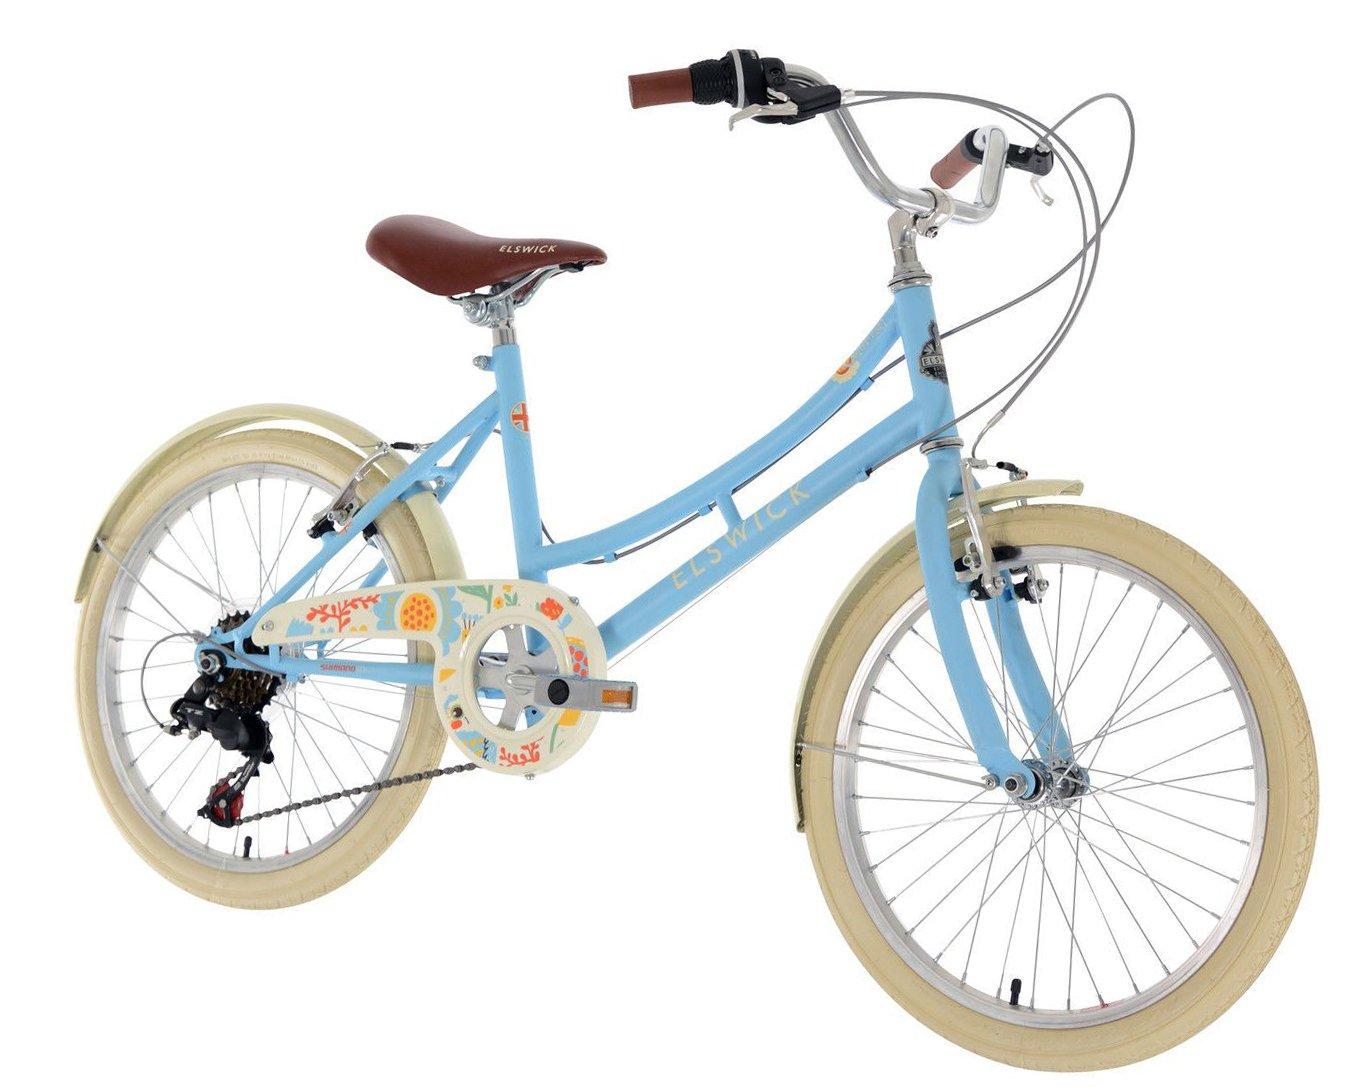 Elswick Cherish Heritage 20 Inch Kids Bike